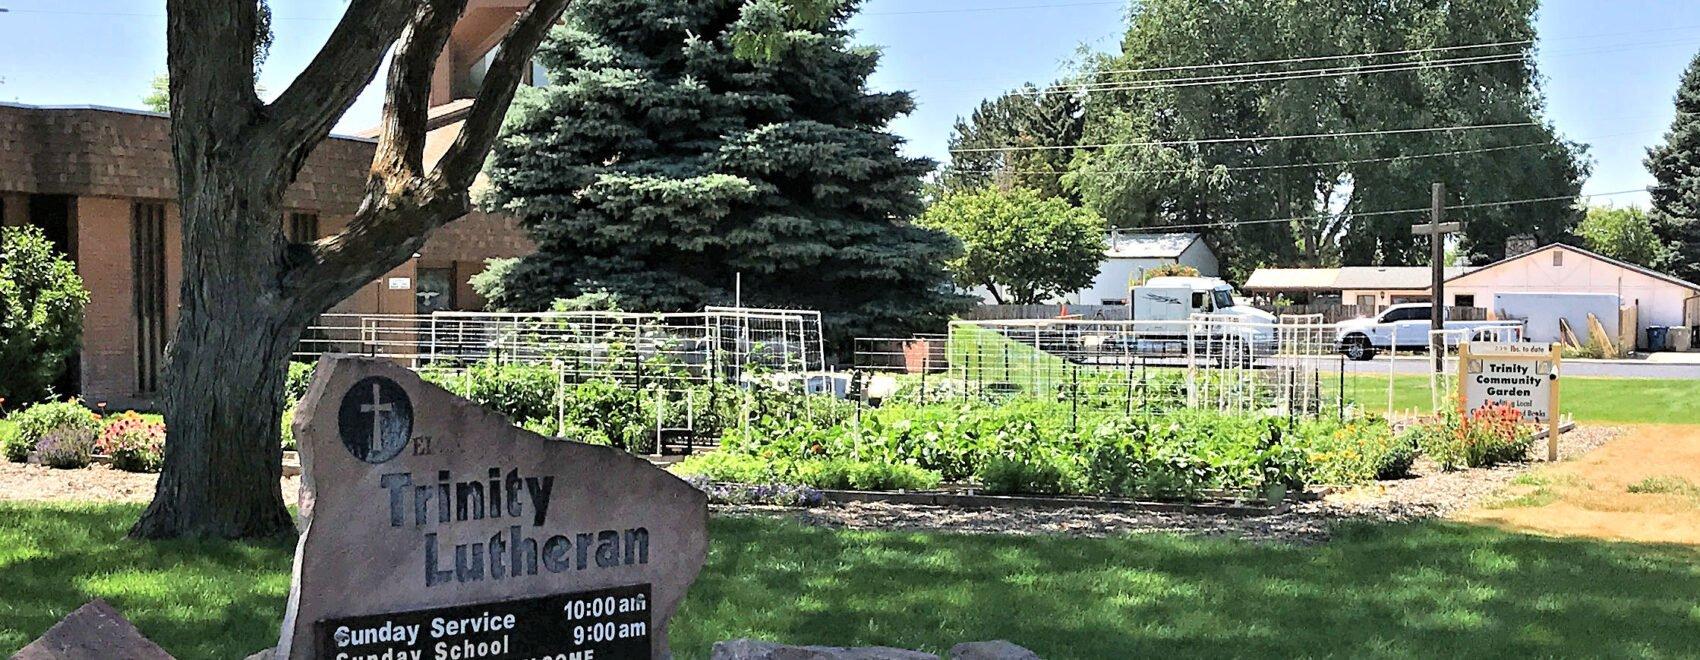 trinity sign and garden